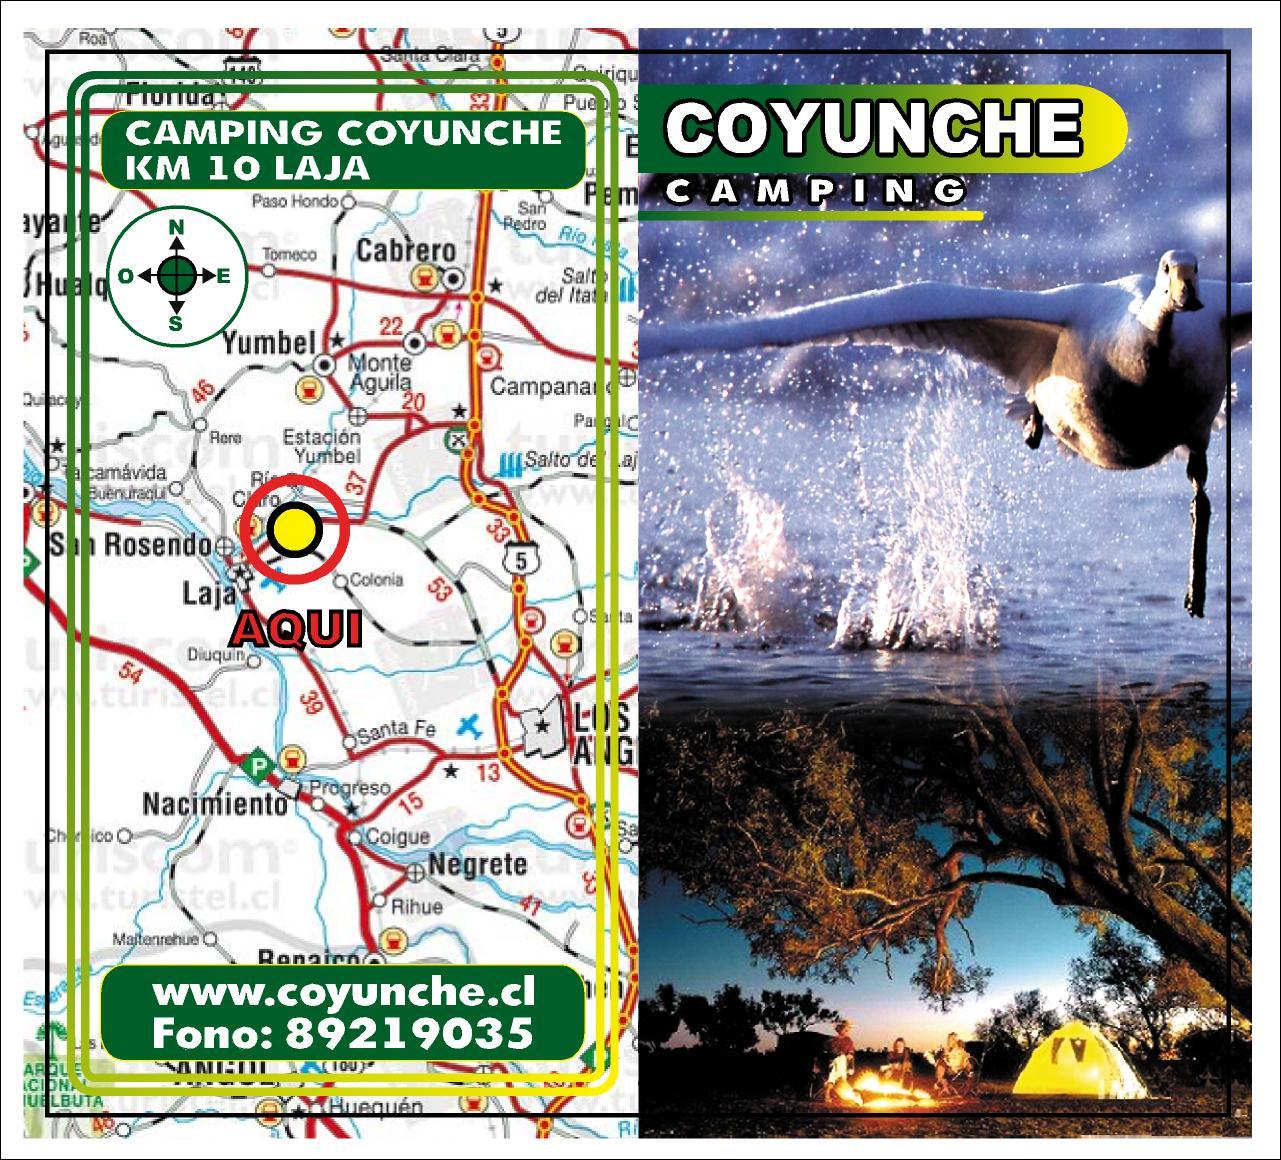 Agencia, Turismo Laja & San Rosendo  Tour  Sostenible Coyunche.cl  989219035